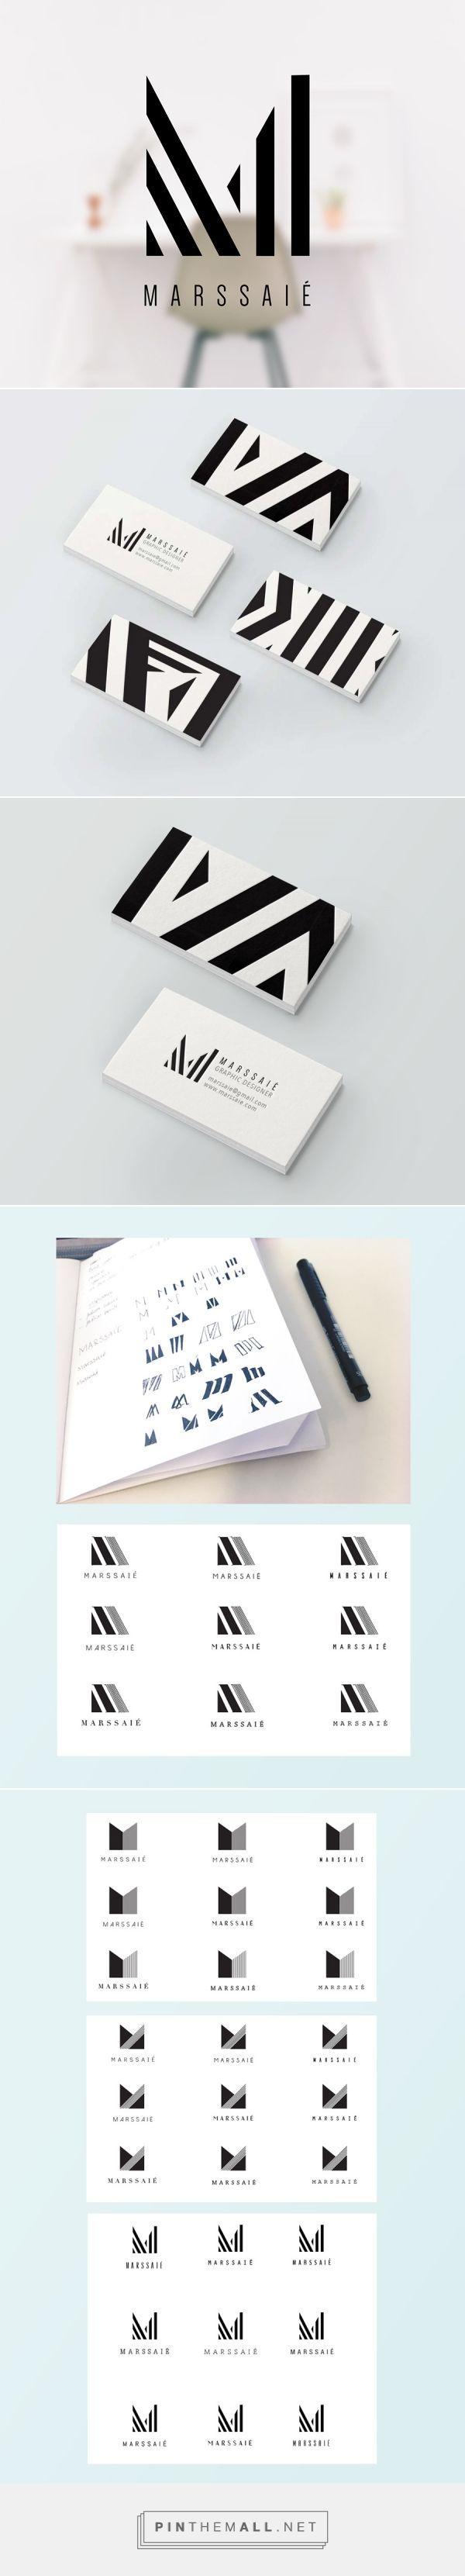 Marssaié - personal identity Graphic designer visual identity www.marssaie.com created via https://pinthemall.net